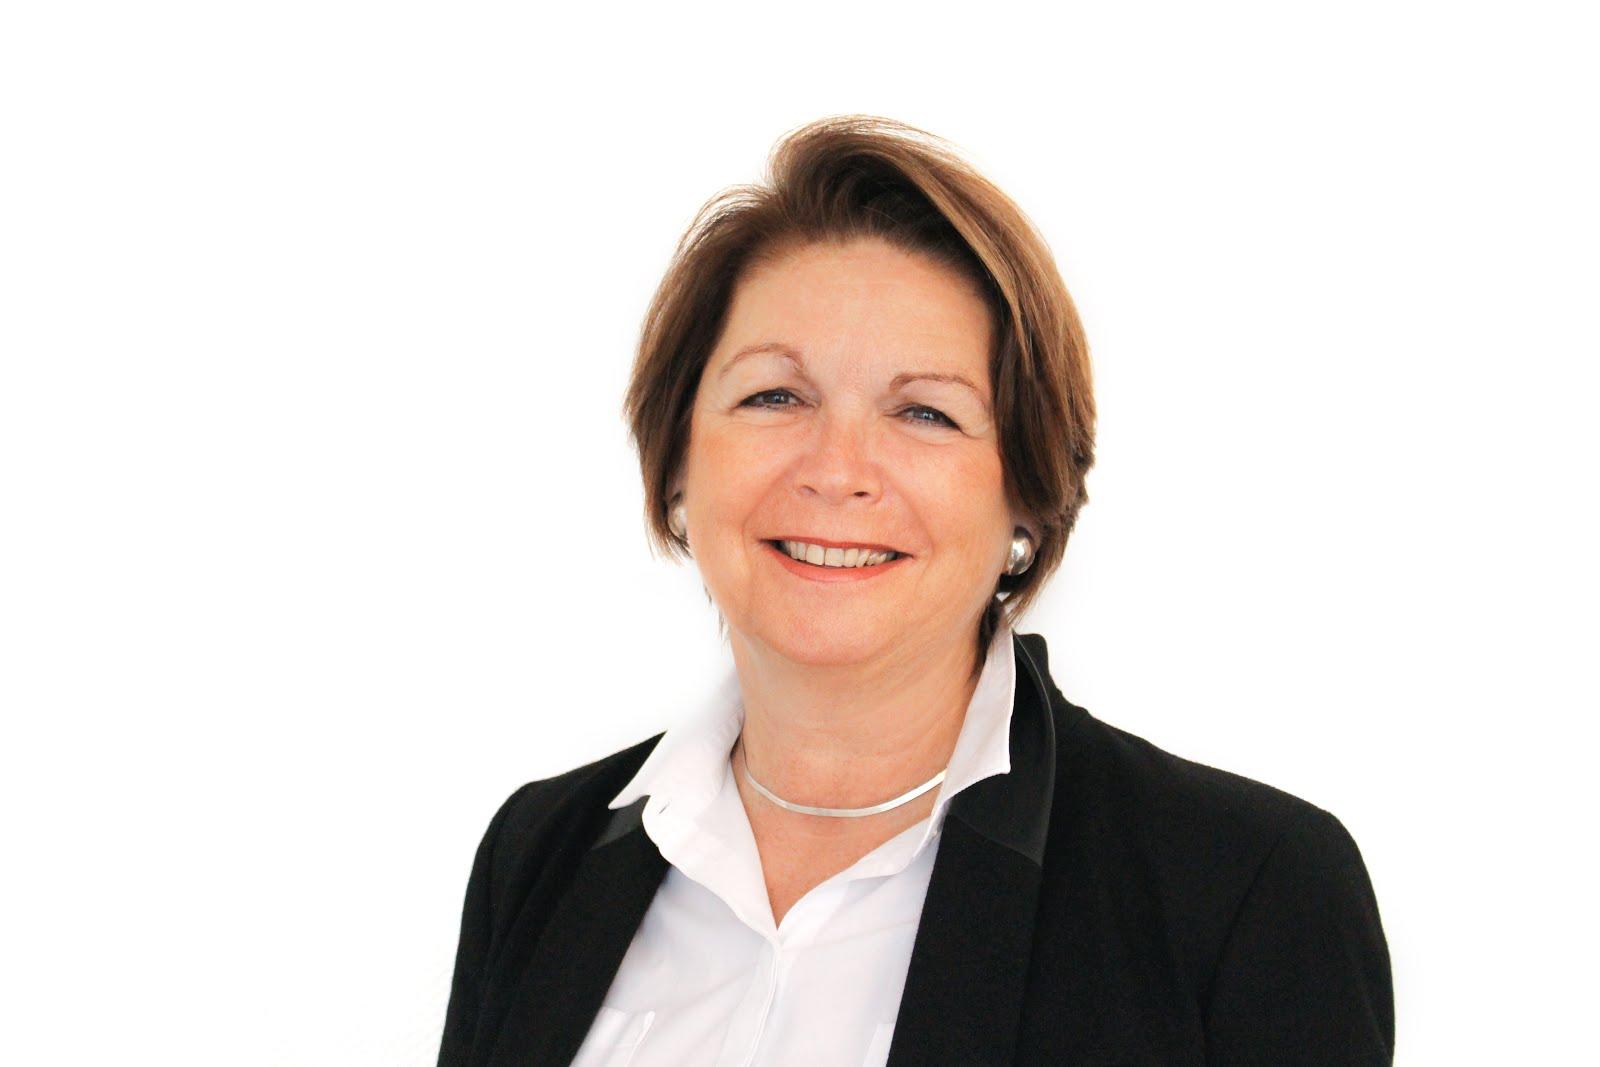 Marie Anne Helman